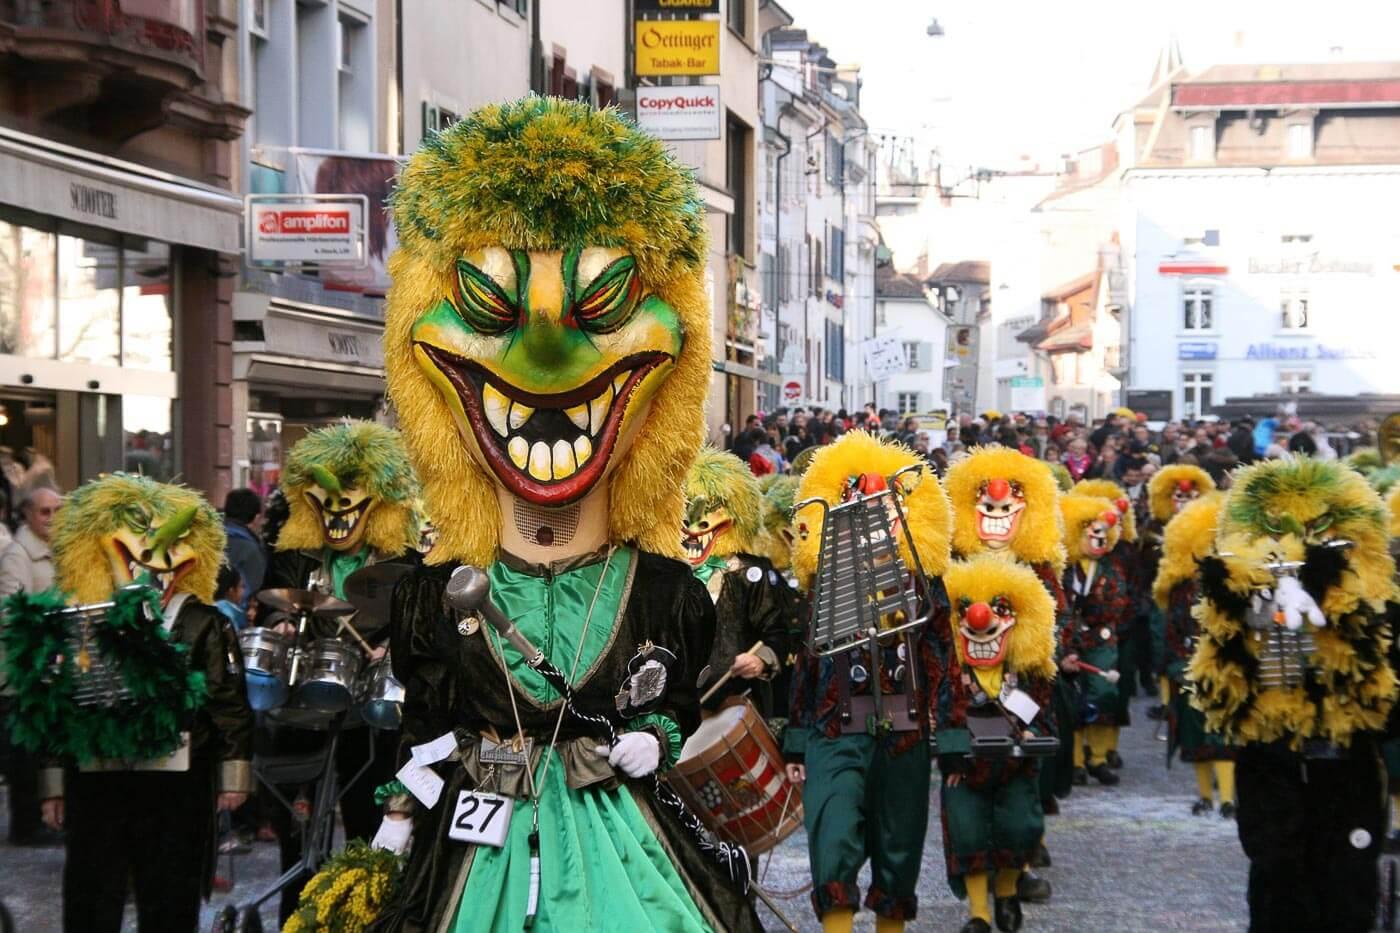 Viagem para Suiça - Turismo para Suíça - Carnaval